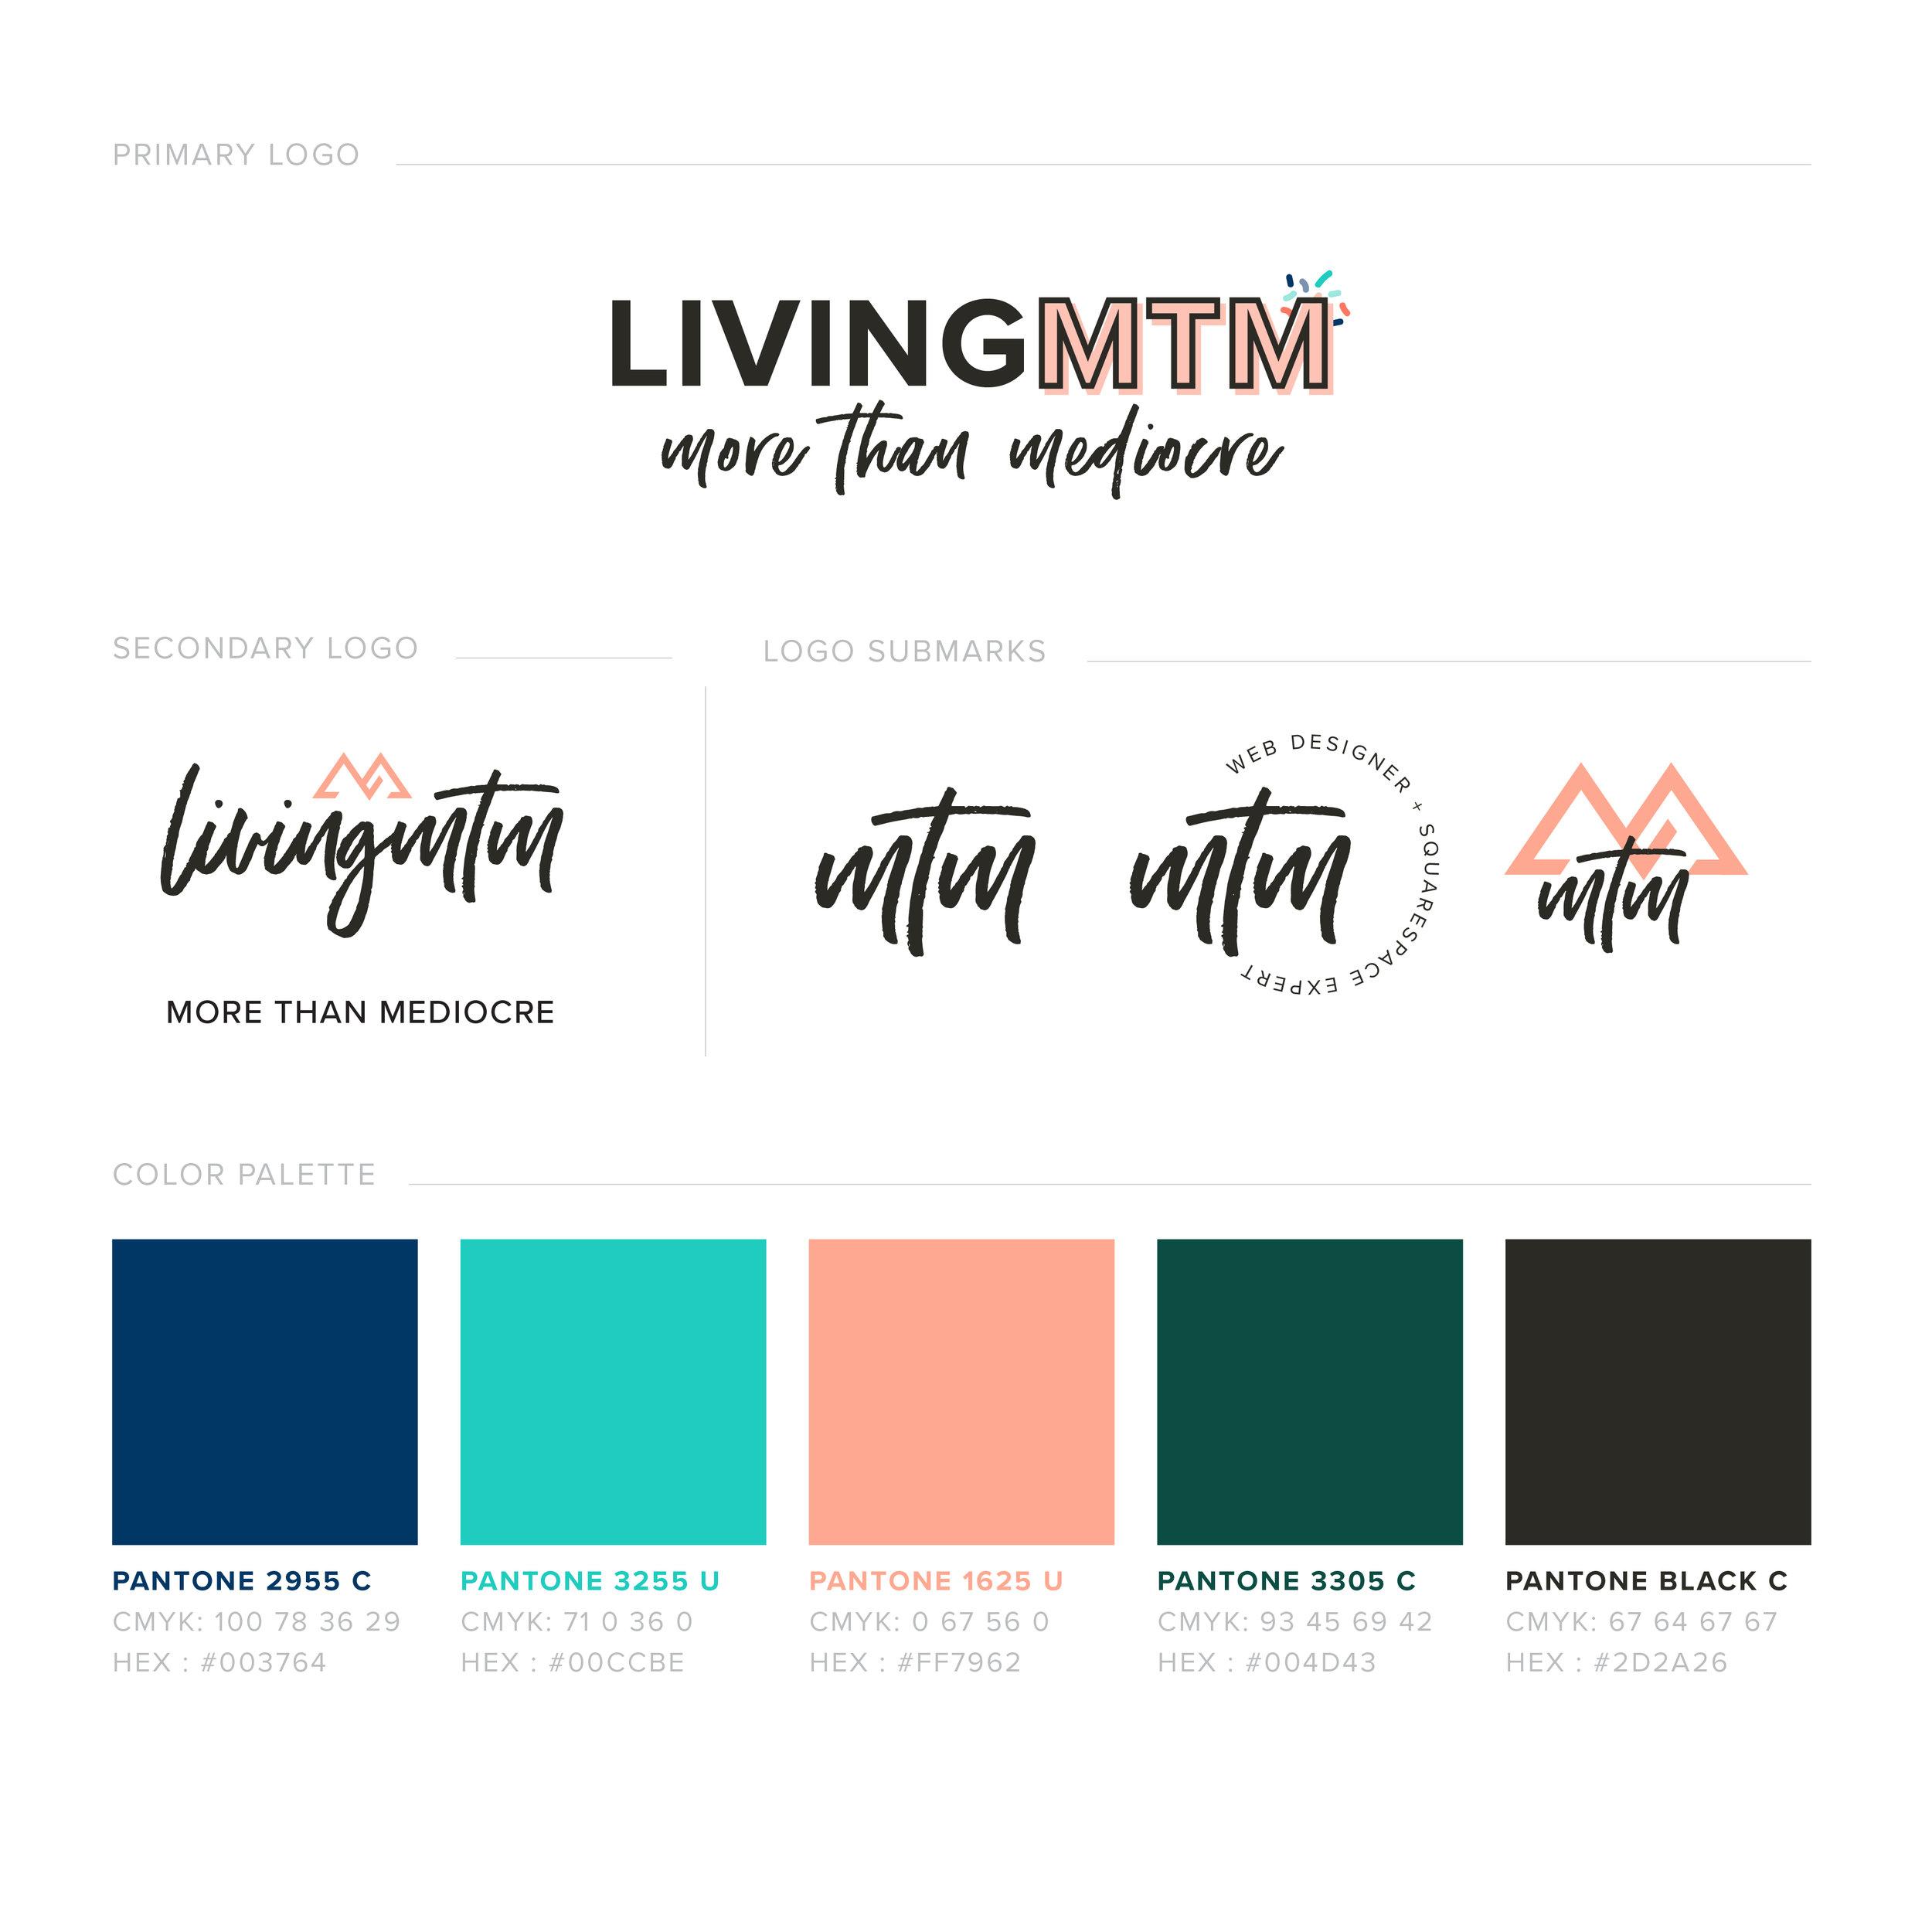 LIVINGMTM-REBRAND-03.jpg